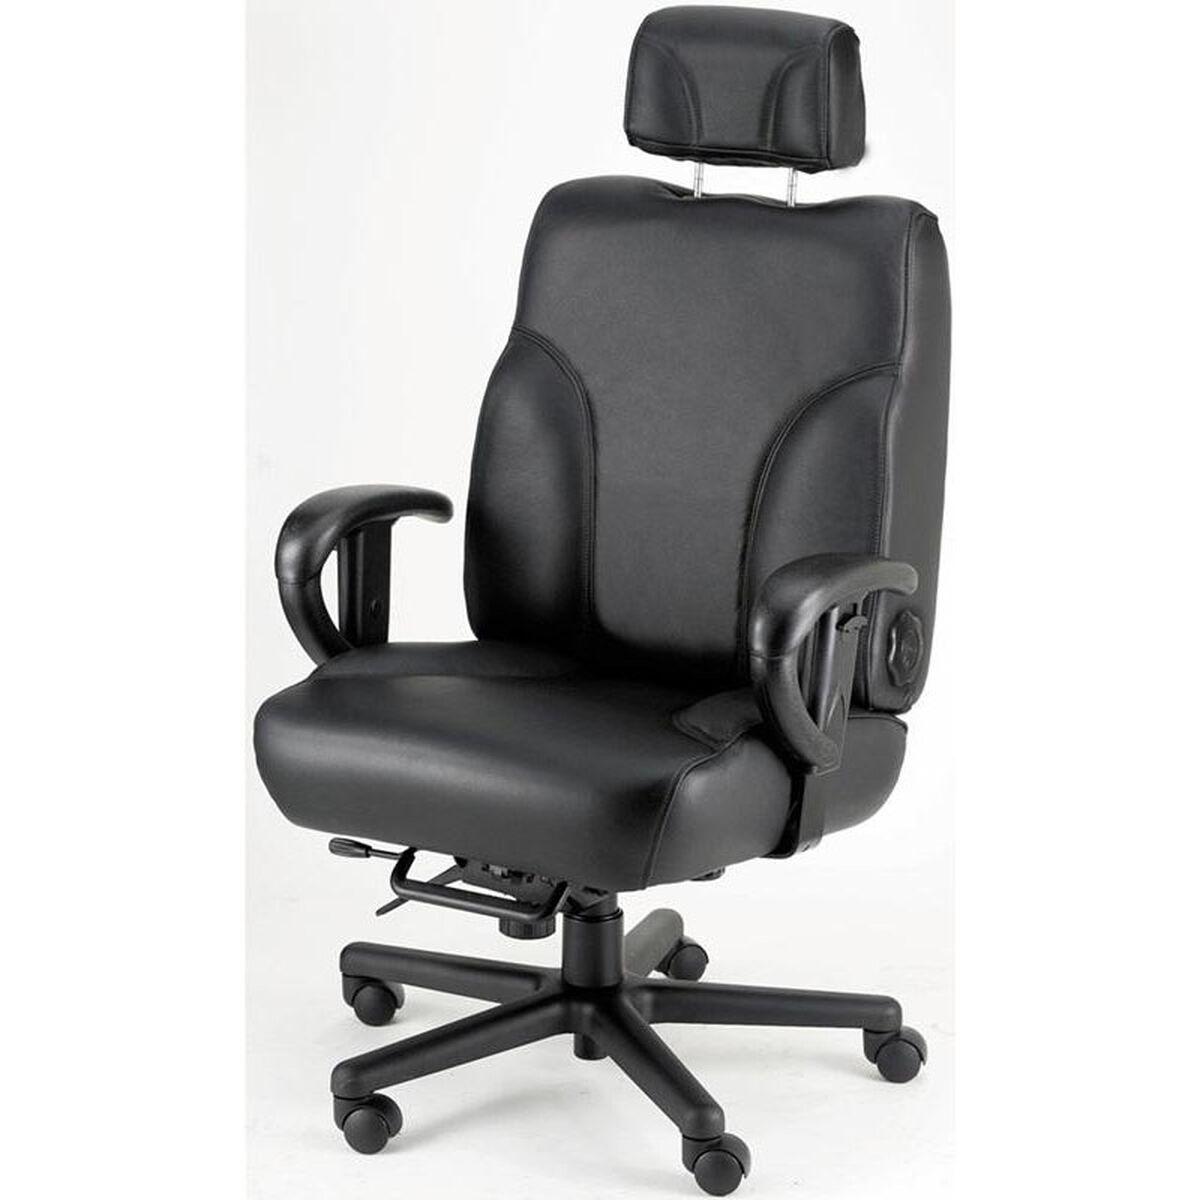 countoured seat chair fabric of backsvr f bizchair com